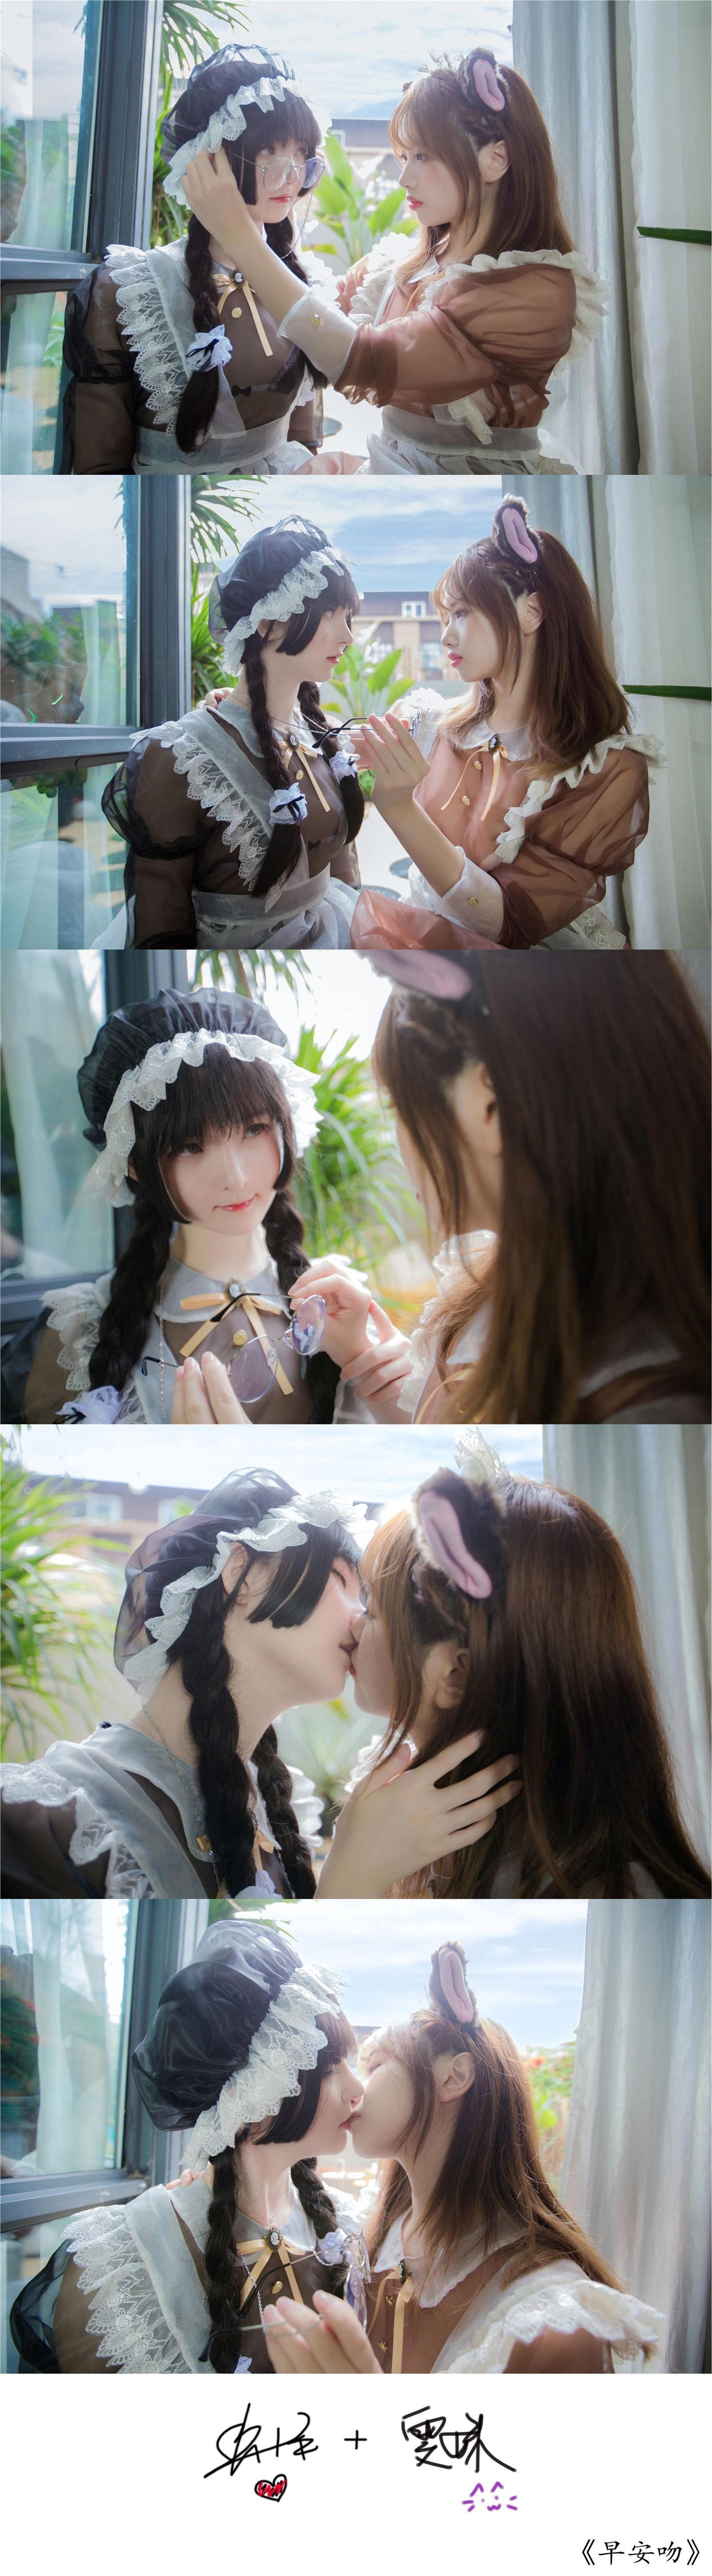 cosplay 一小央泽-《早安吻》(20P)